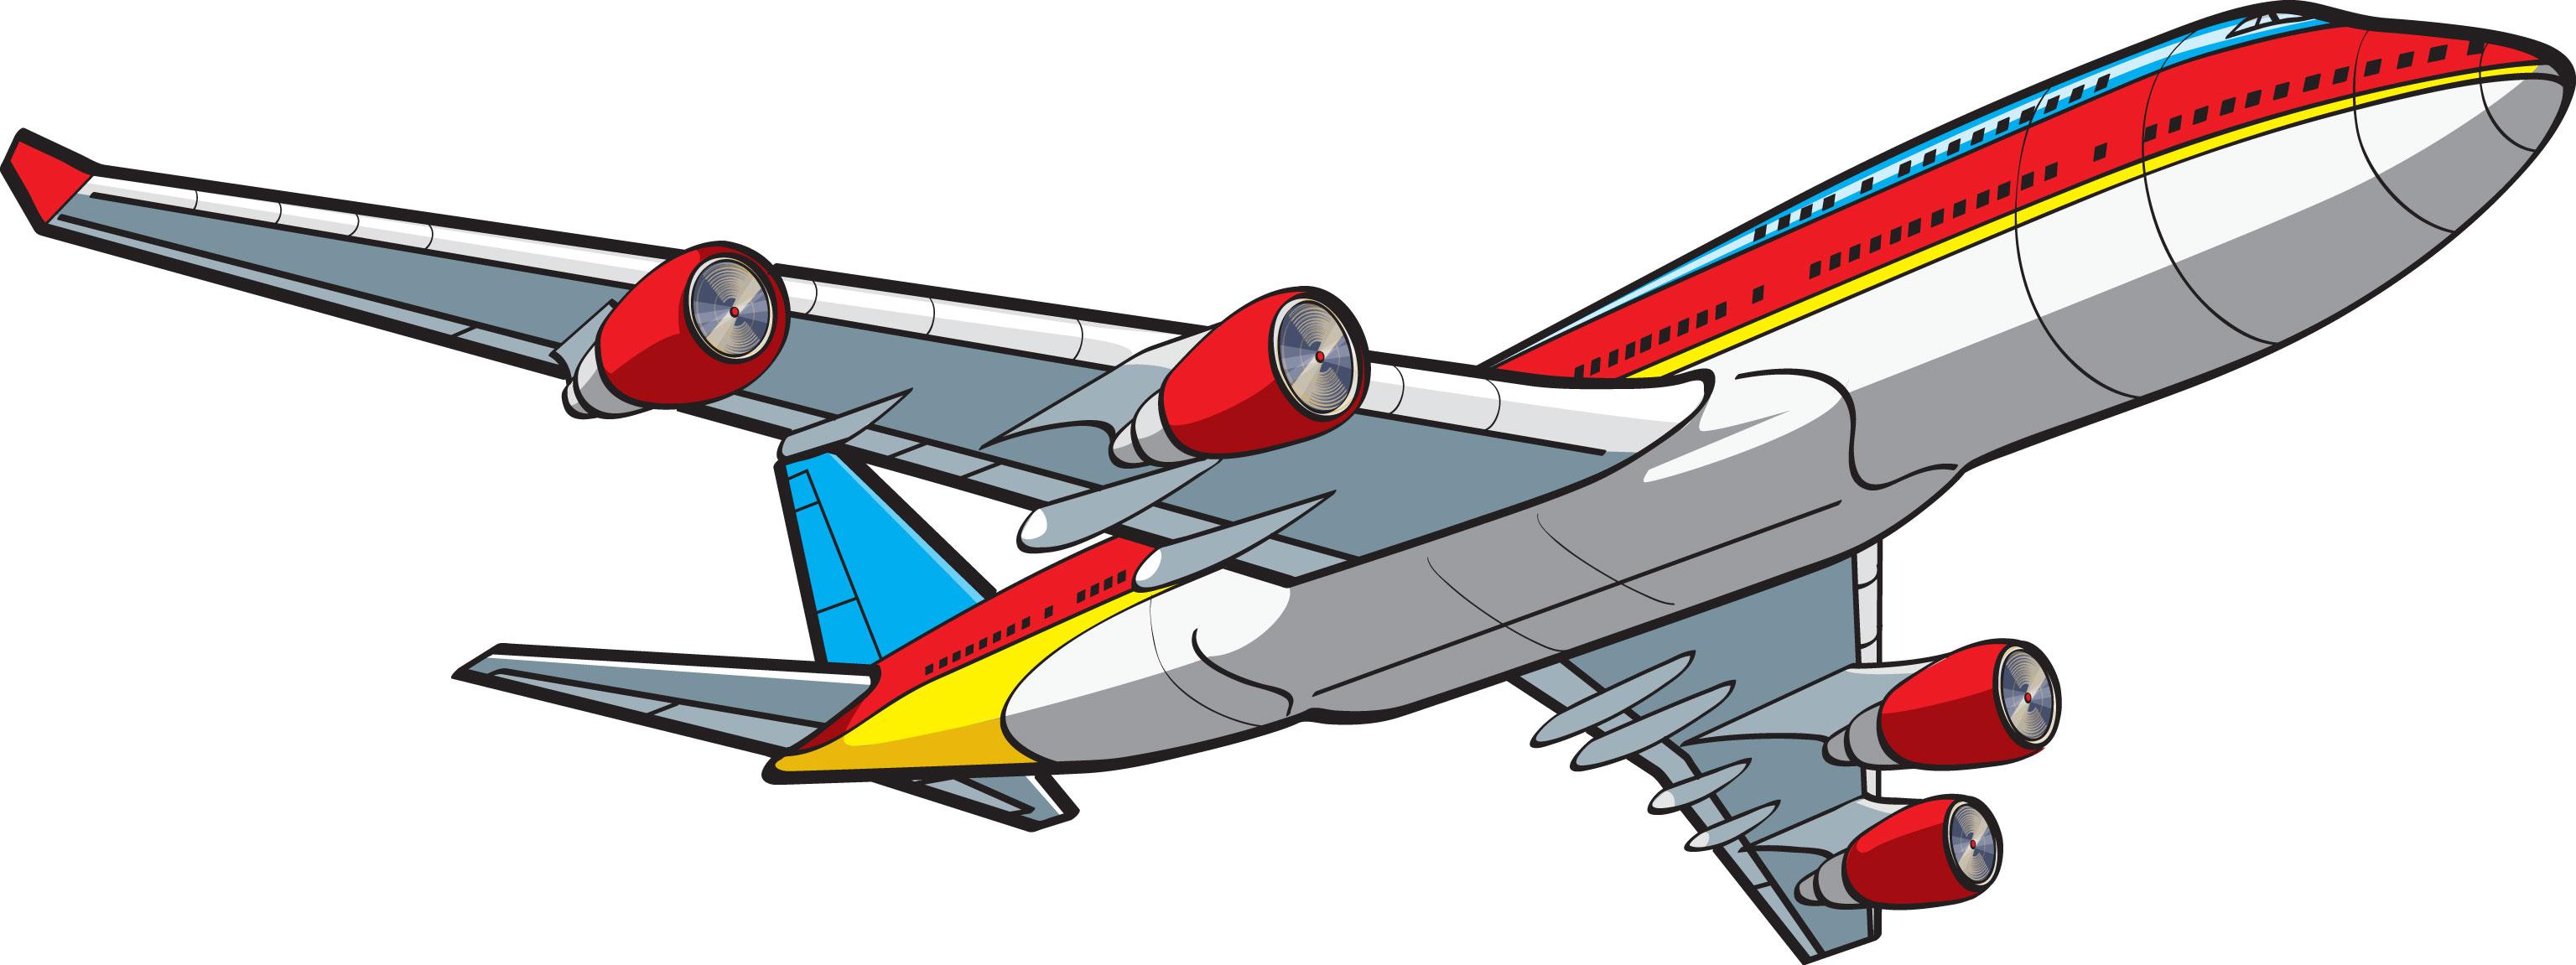 cute airplane clipart-cute airplane clipart-2